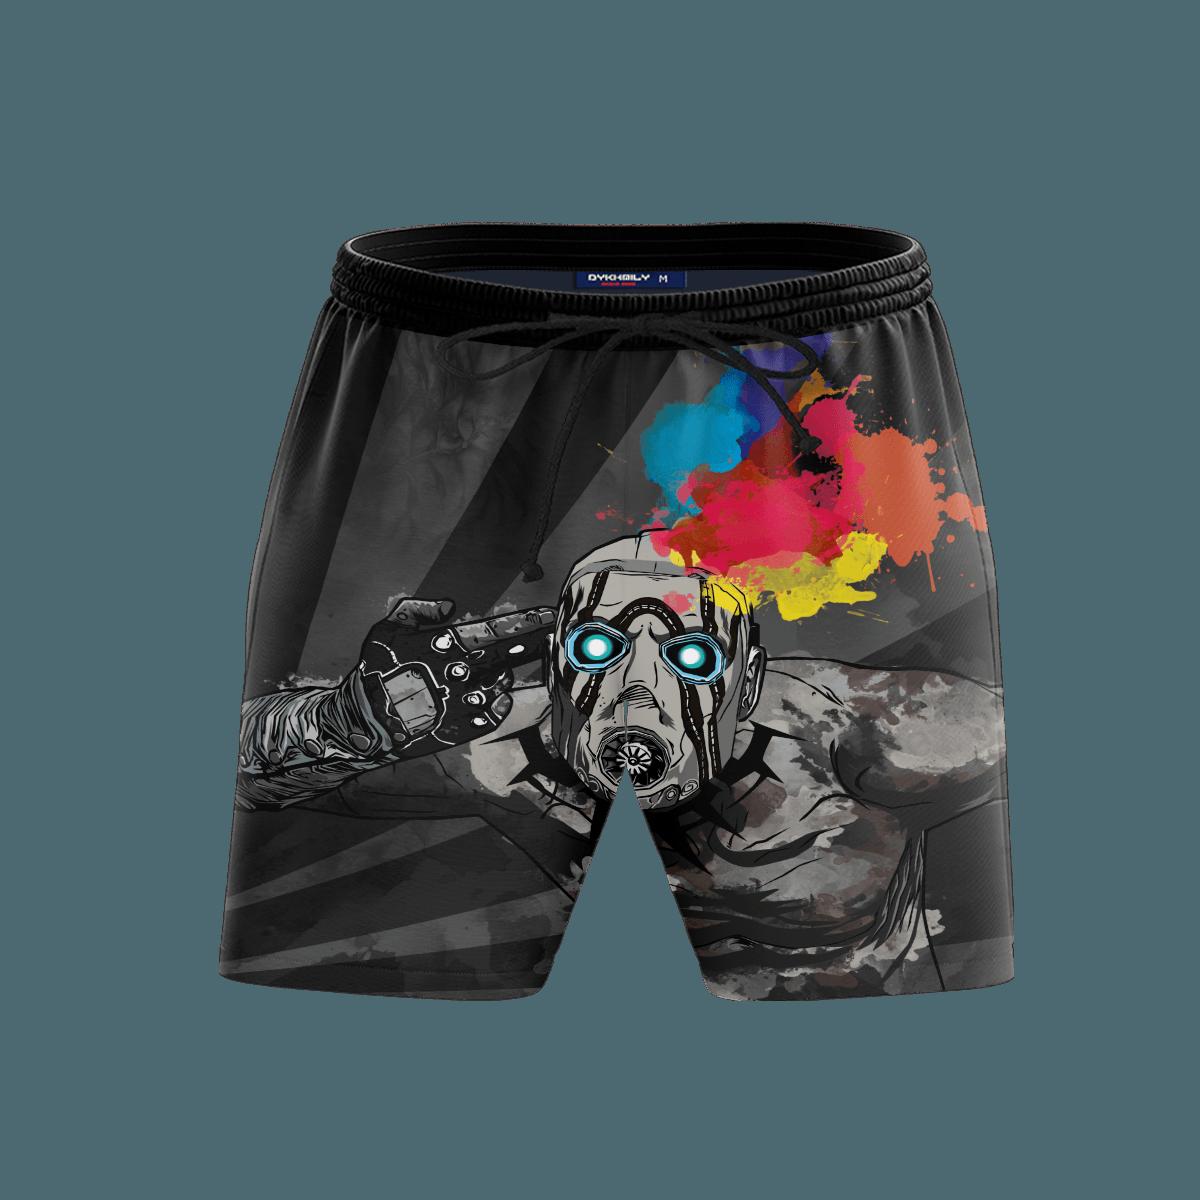 Legendary Psycho Beach Shorts FDM3107 S Official Anime Swimsuit Merch